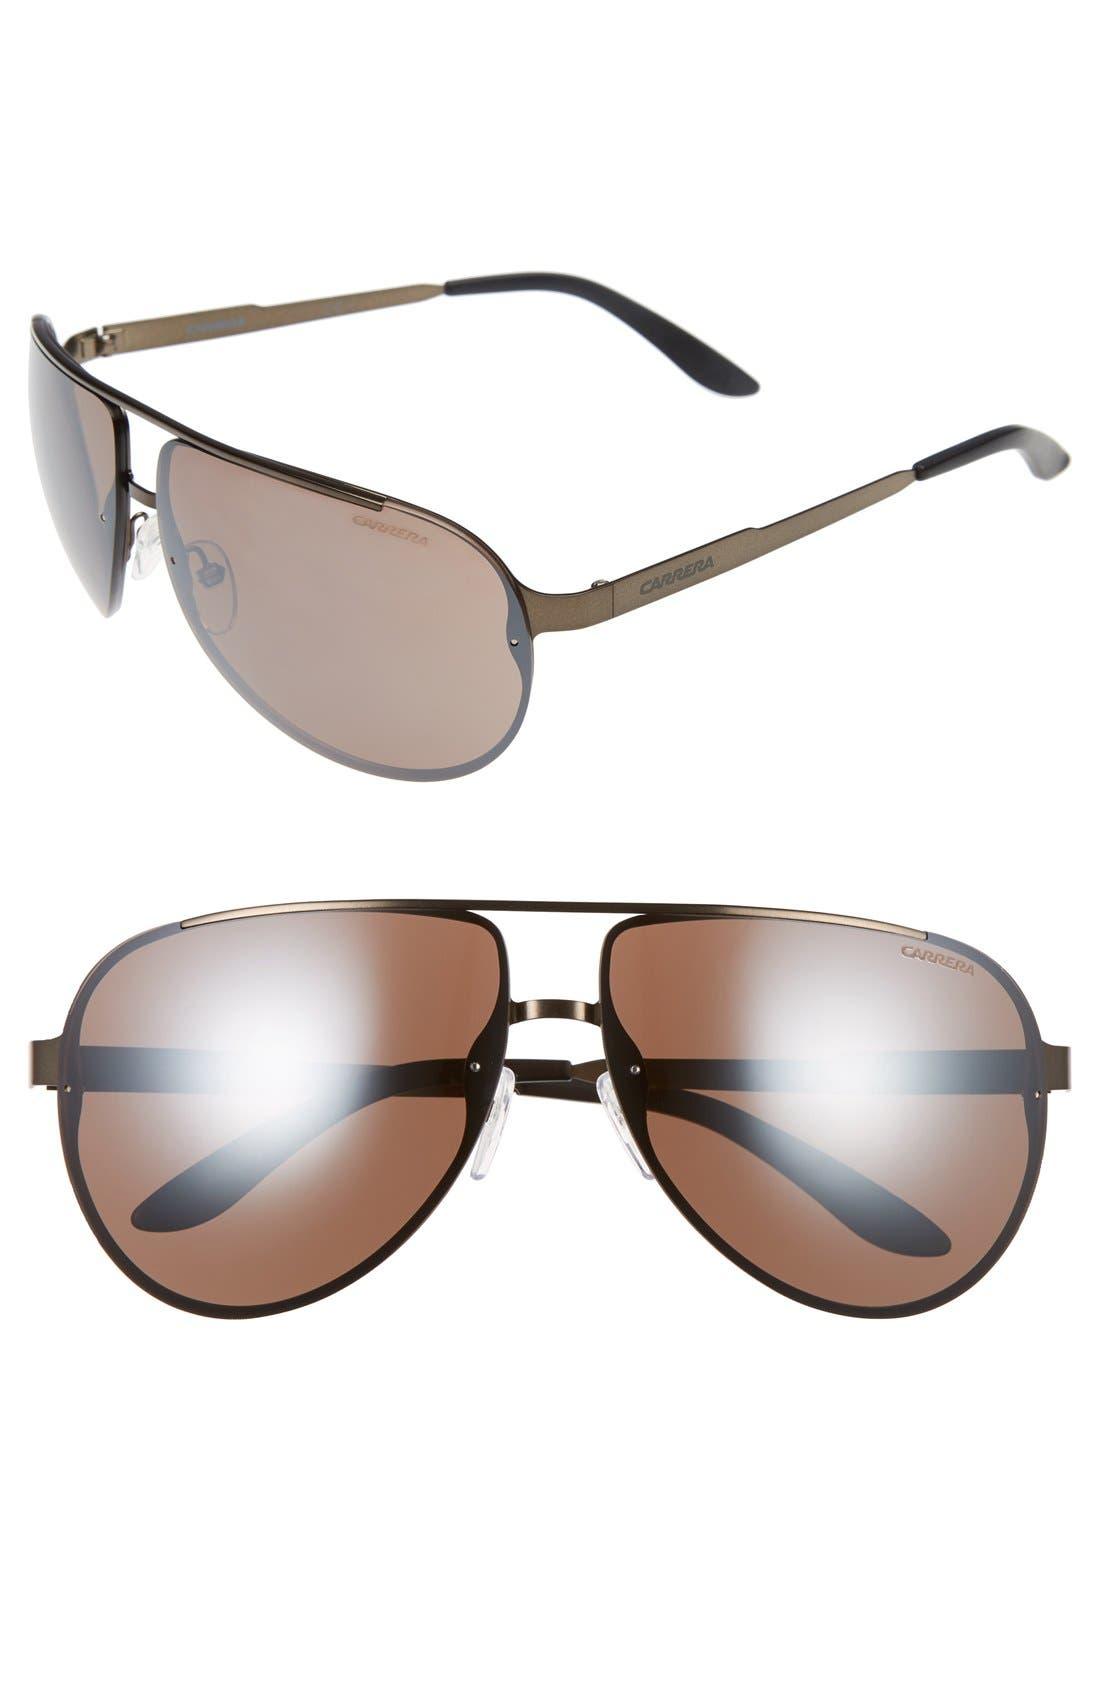 Main Image - Carrera Eyewear CA102 65mm Aviator Sunglasses